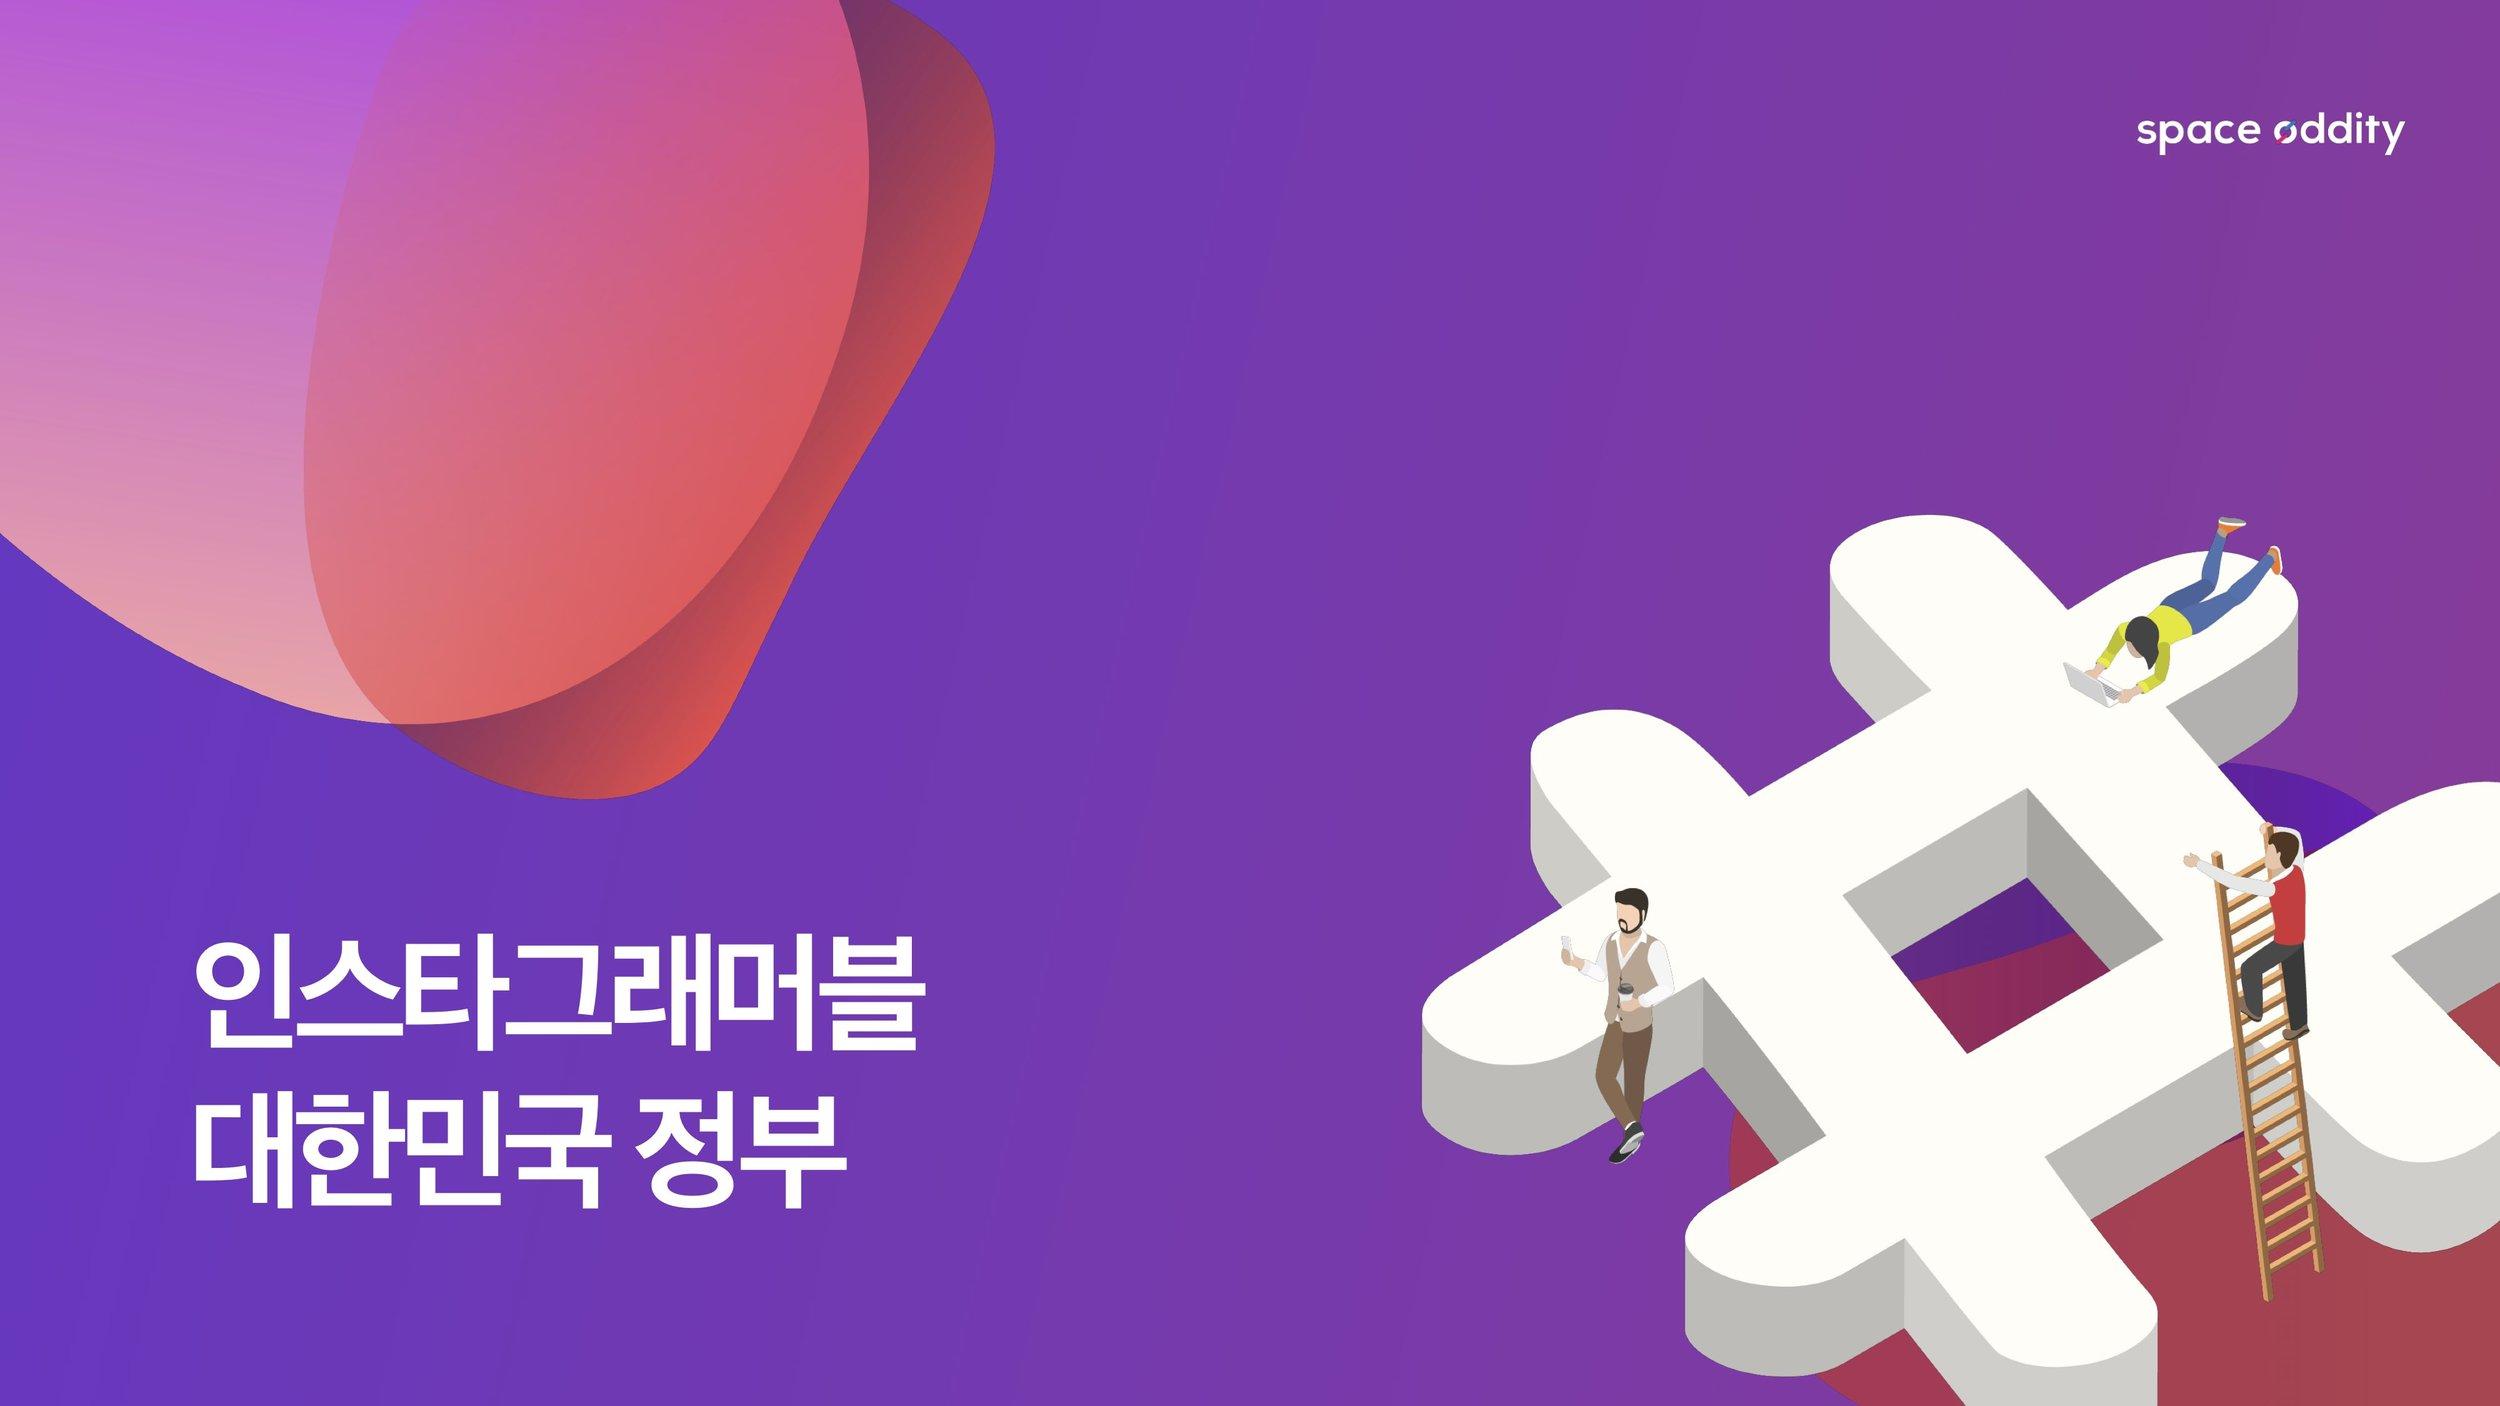 - korea government instagram consulting